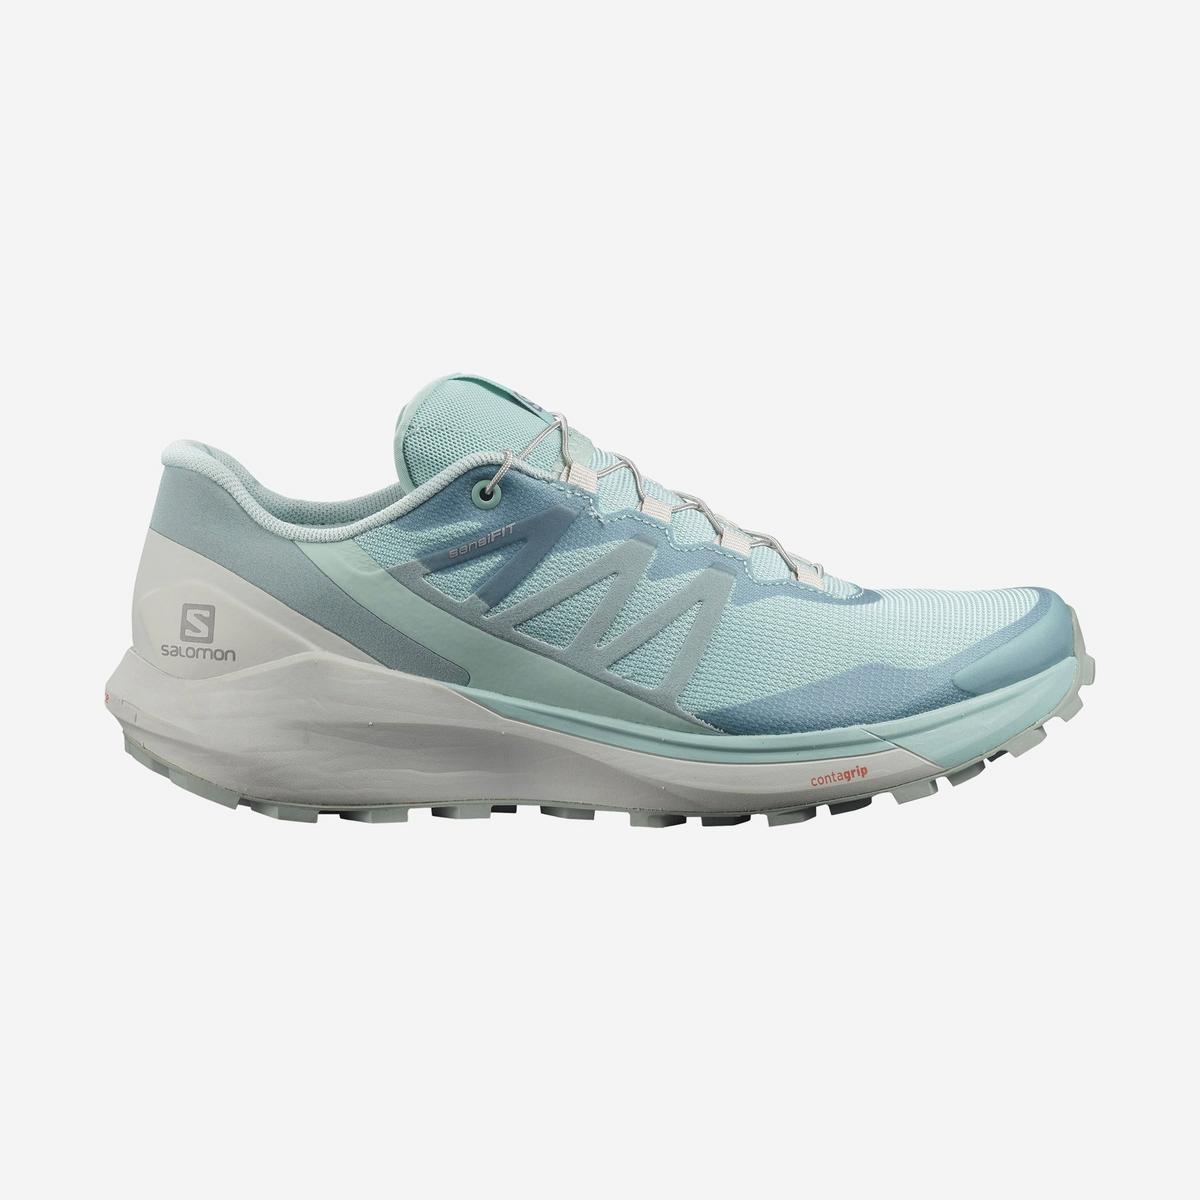 Salomon Women's Sense Ride 4 Trail Running Shoe - Pastel Turquoise/ Lunar Rock/ Slate